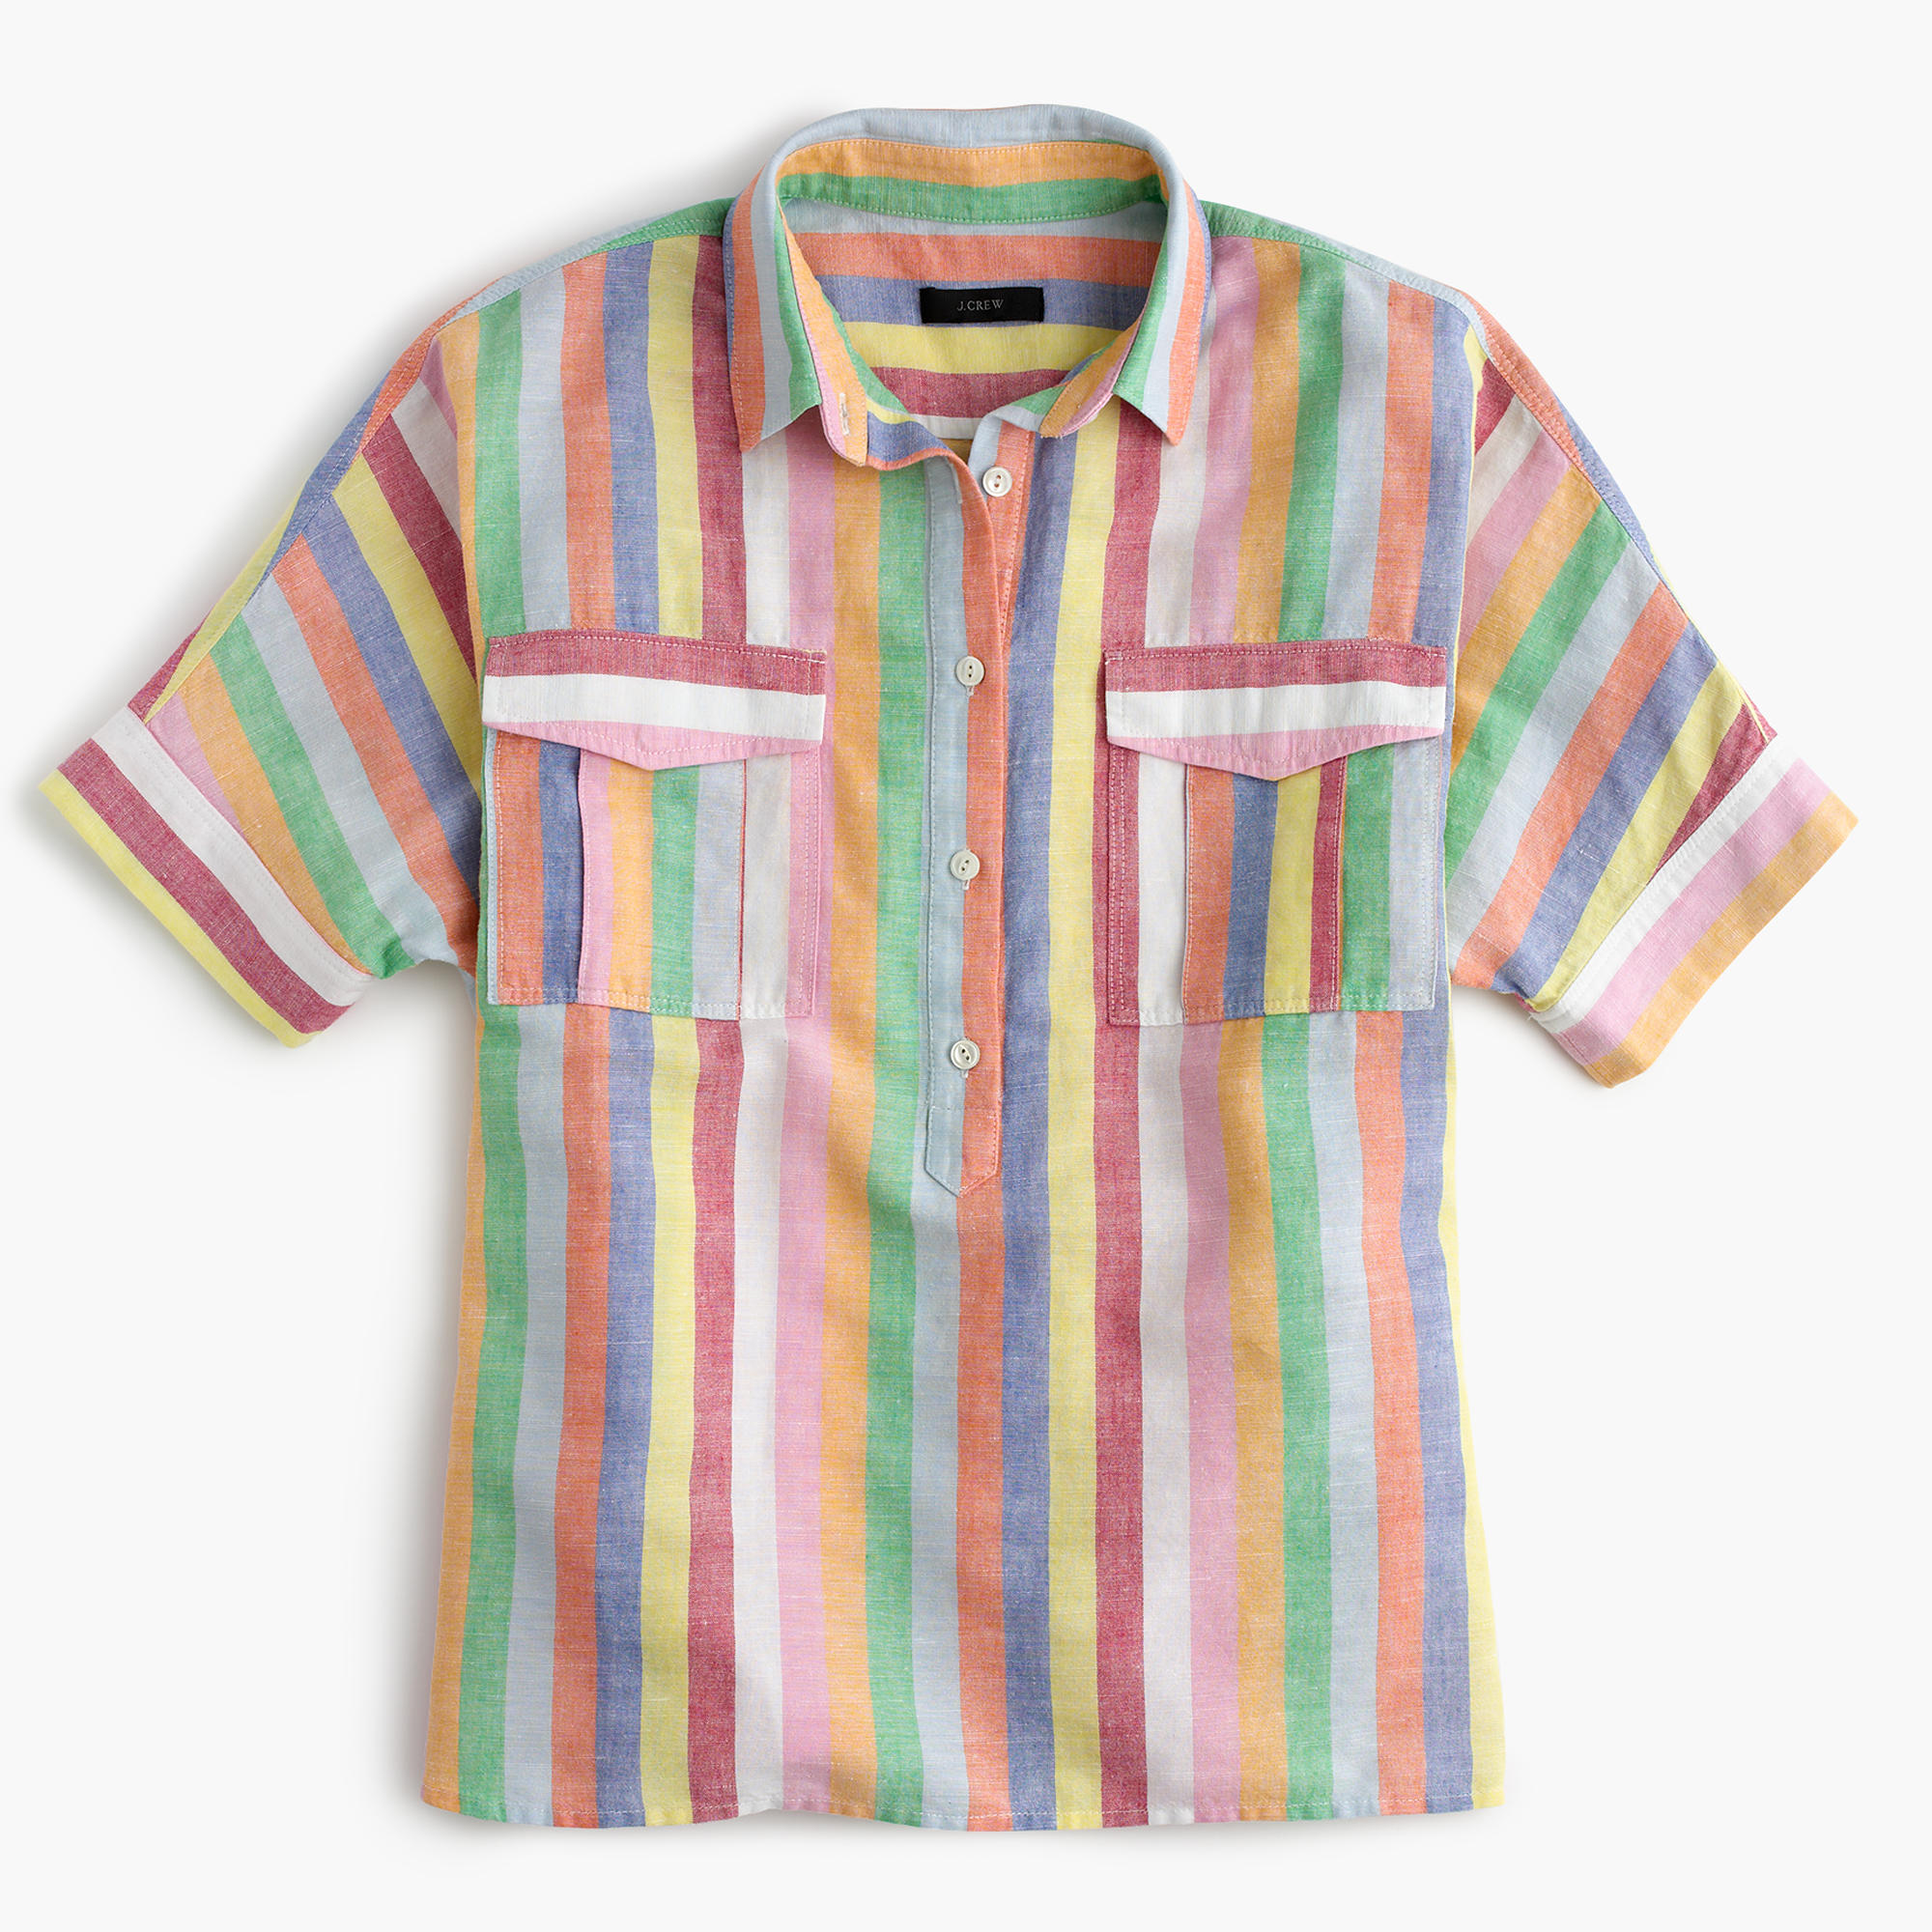 Short Sleeve Popover Shirt In Candy Stripe Women Button